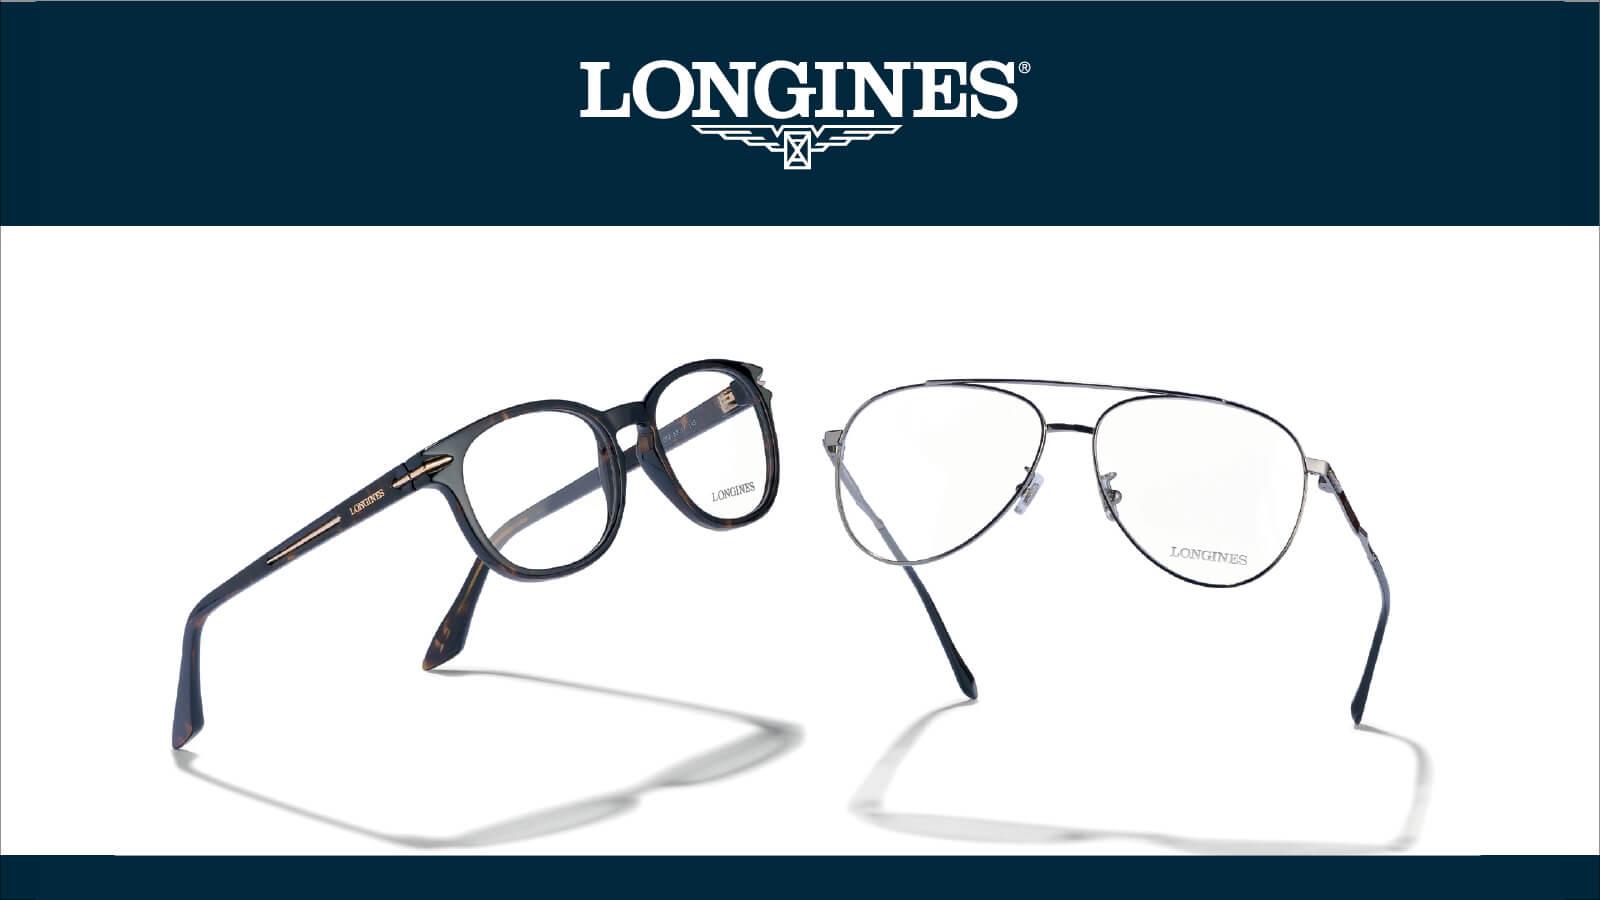 Optical Longines SS20 Landscape